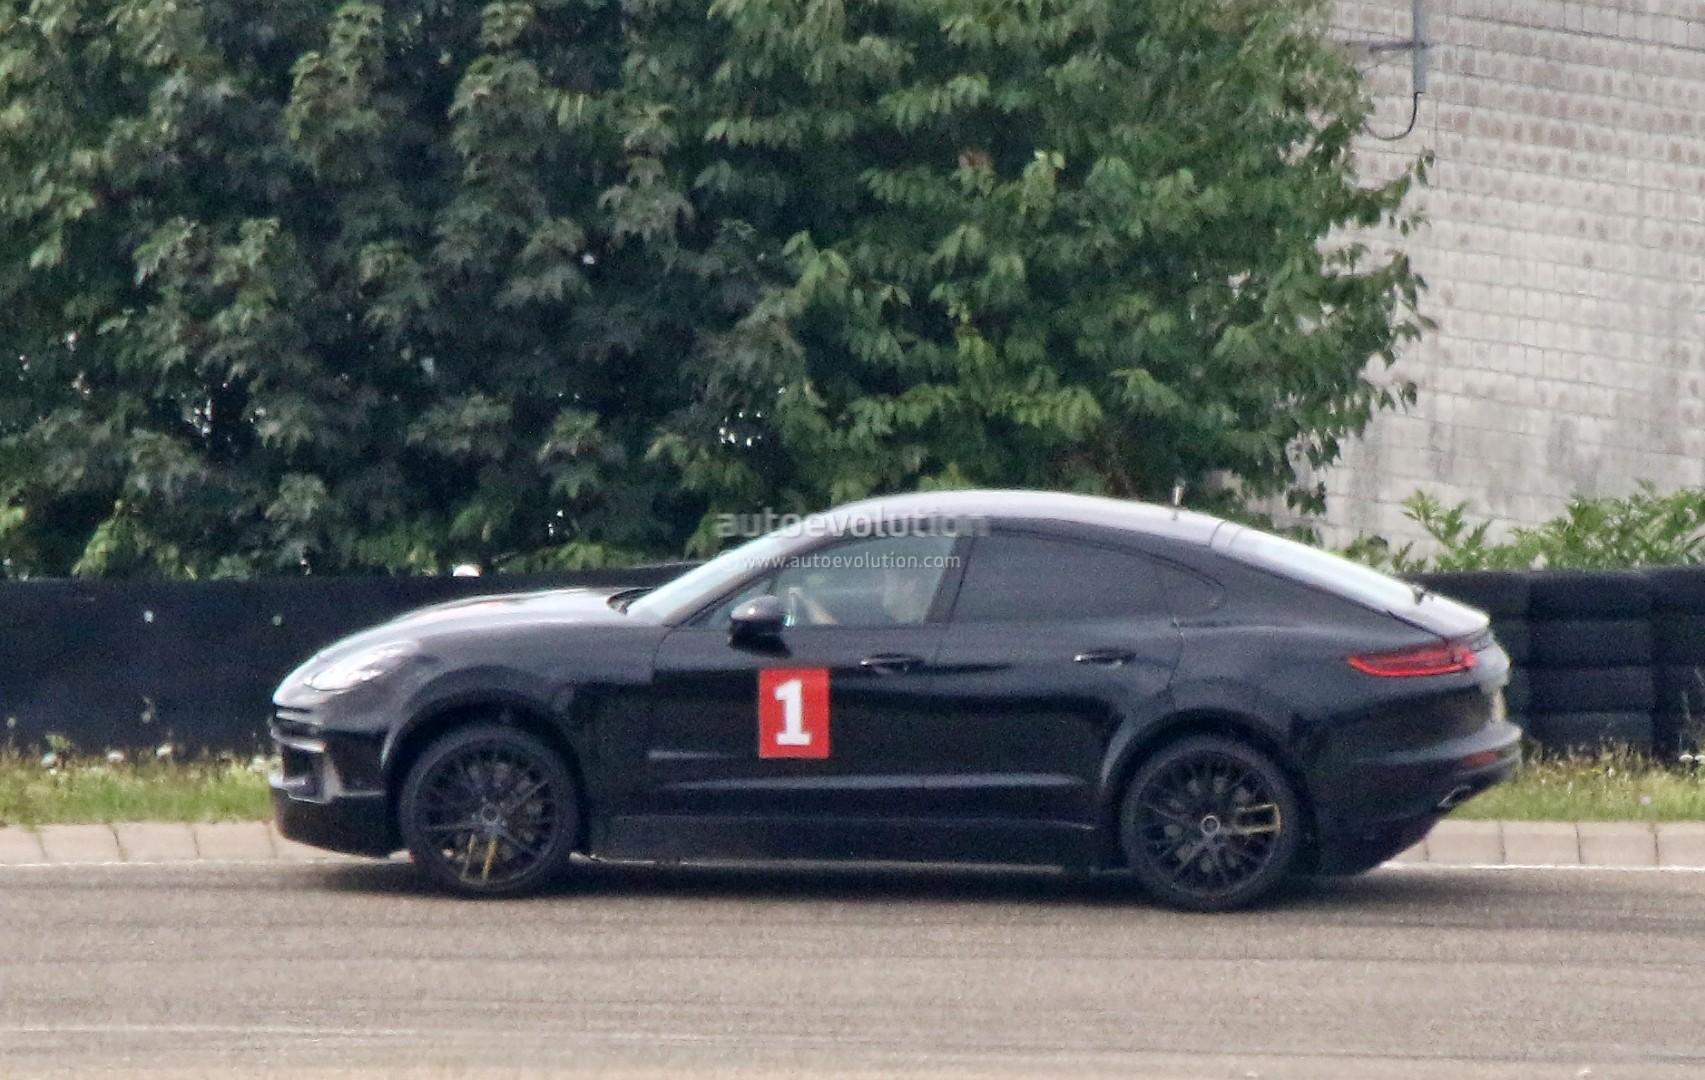 porsche-sahara-suv-coupe-makes-spyshot-debut-as-lifted-panamera-test-car_8